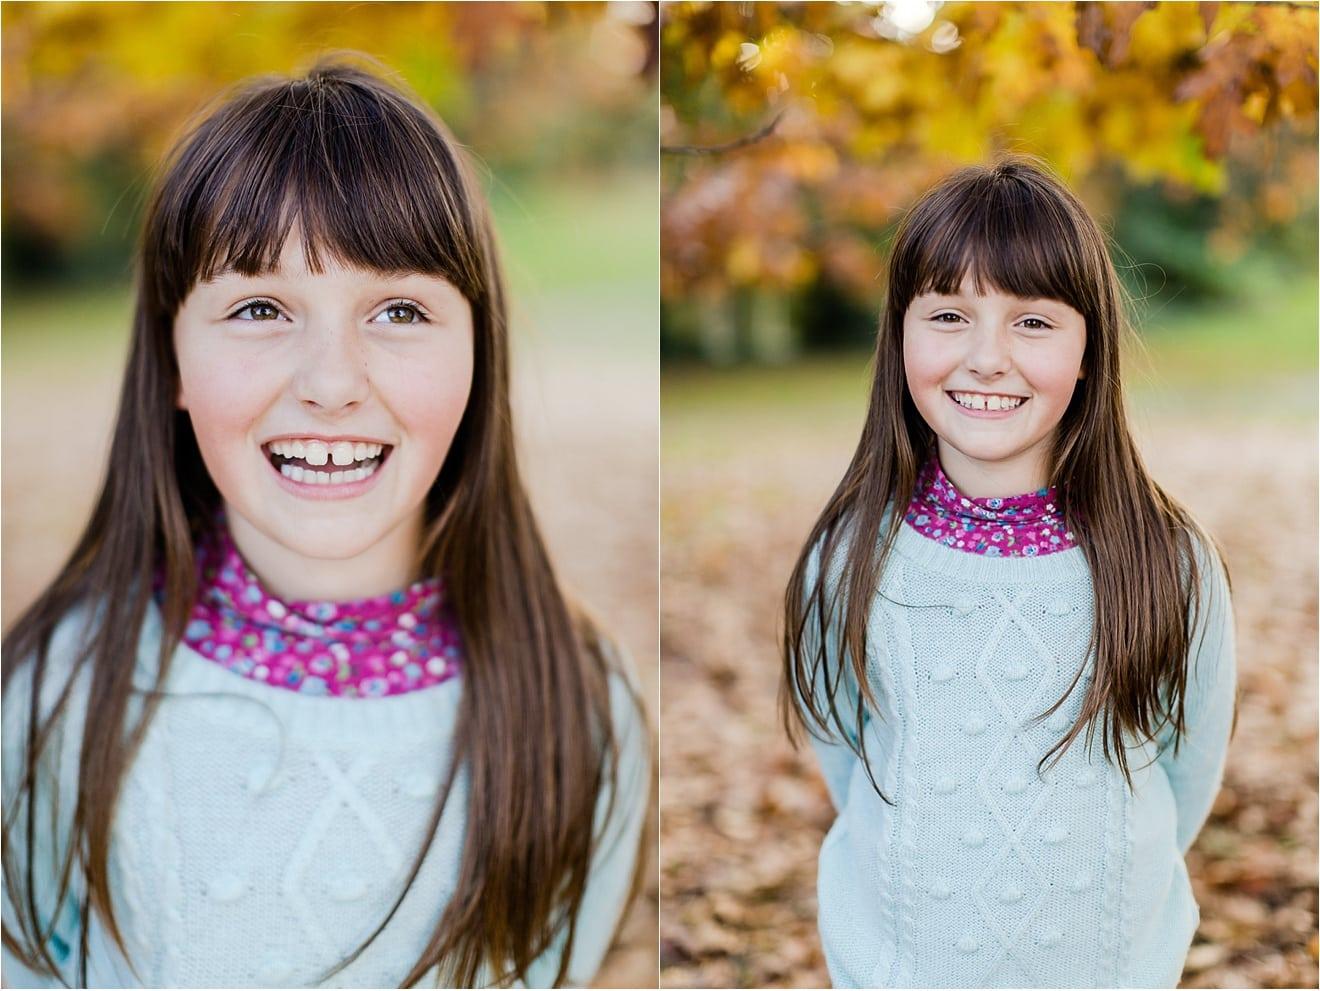 020_family-photography-surrey-autumn-mini-session-eddie-judd-photographer_9713